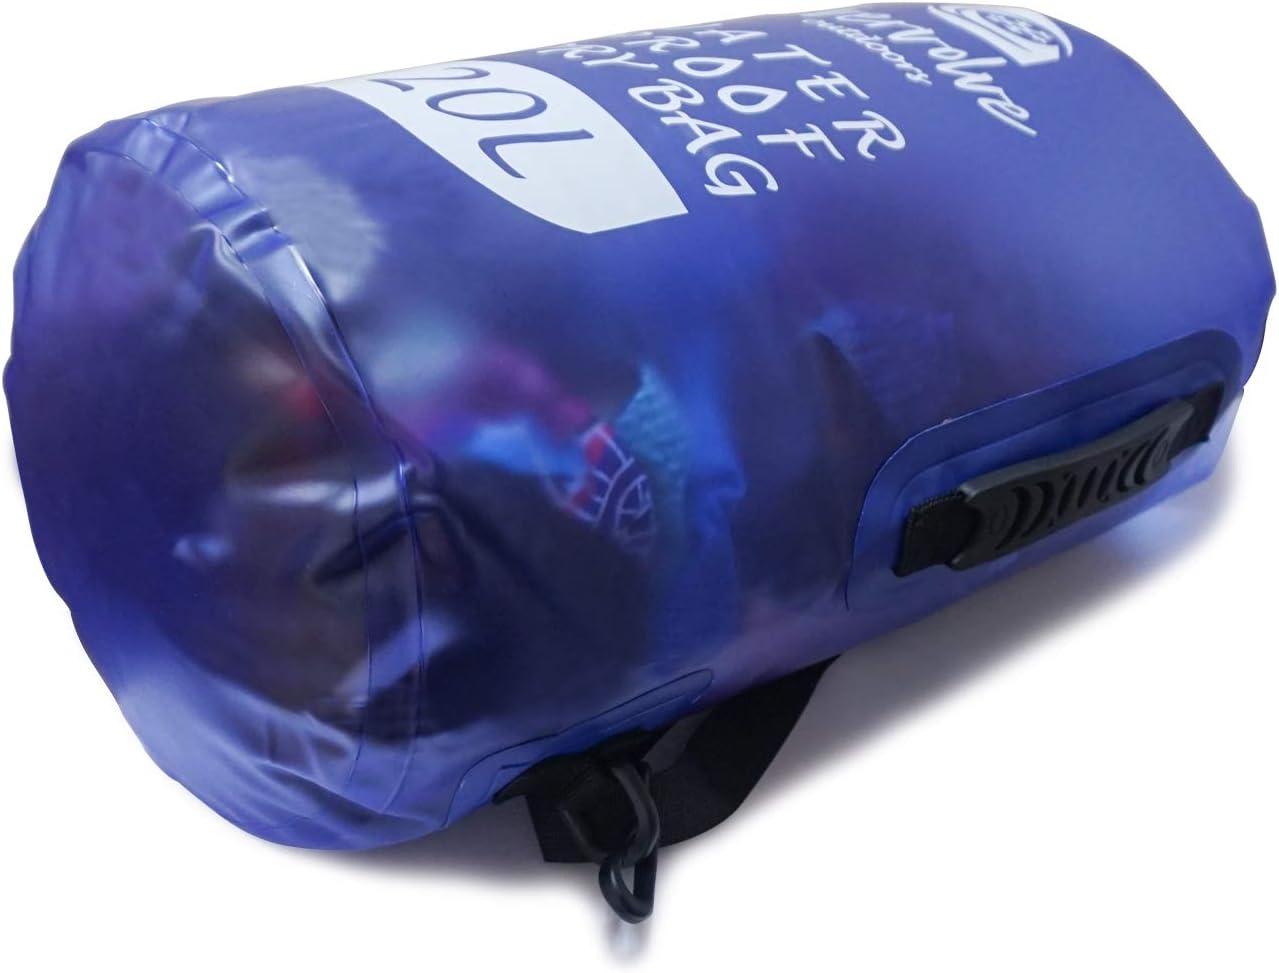 Vgowater Evervolve Bolsa Impermeable para Kayak 15 L, 20 L Acampada